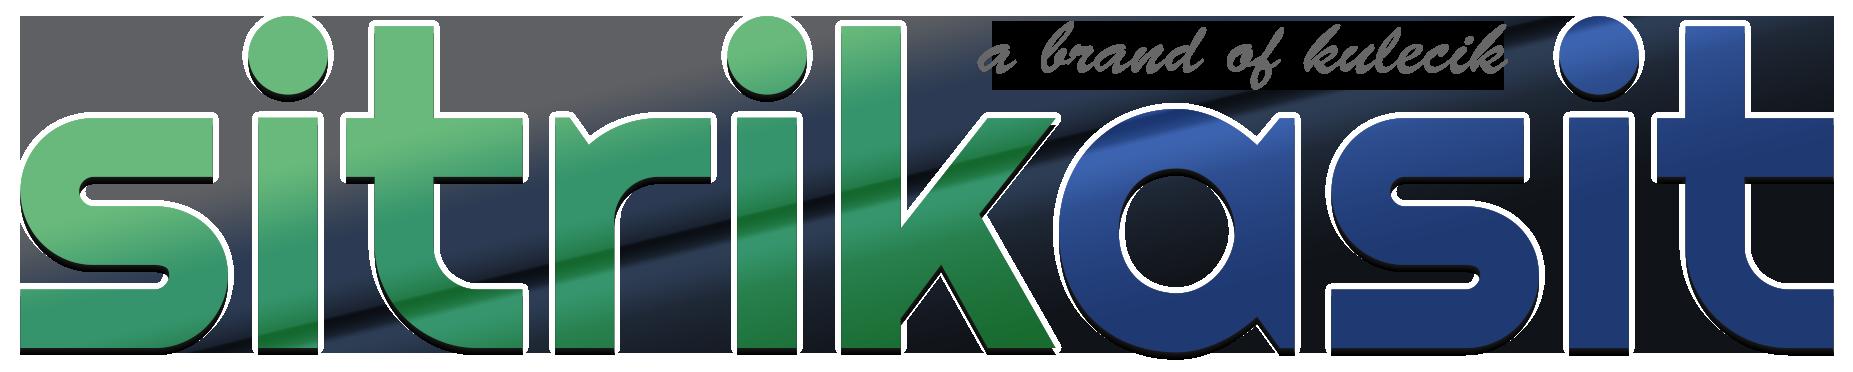 sitrik-asit-yeni-logo4_nolin